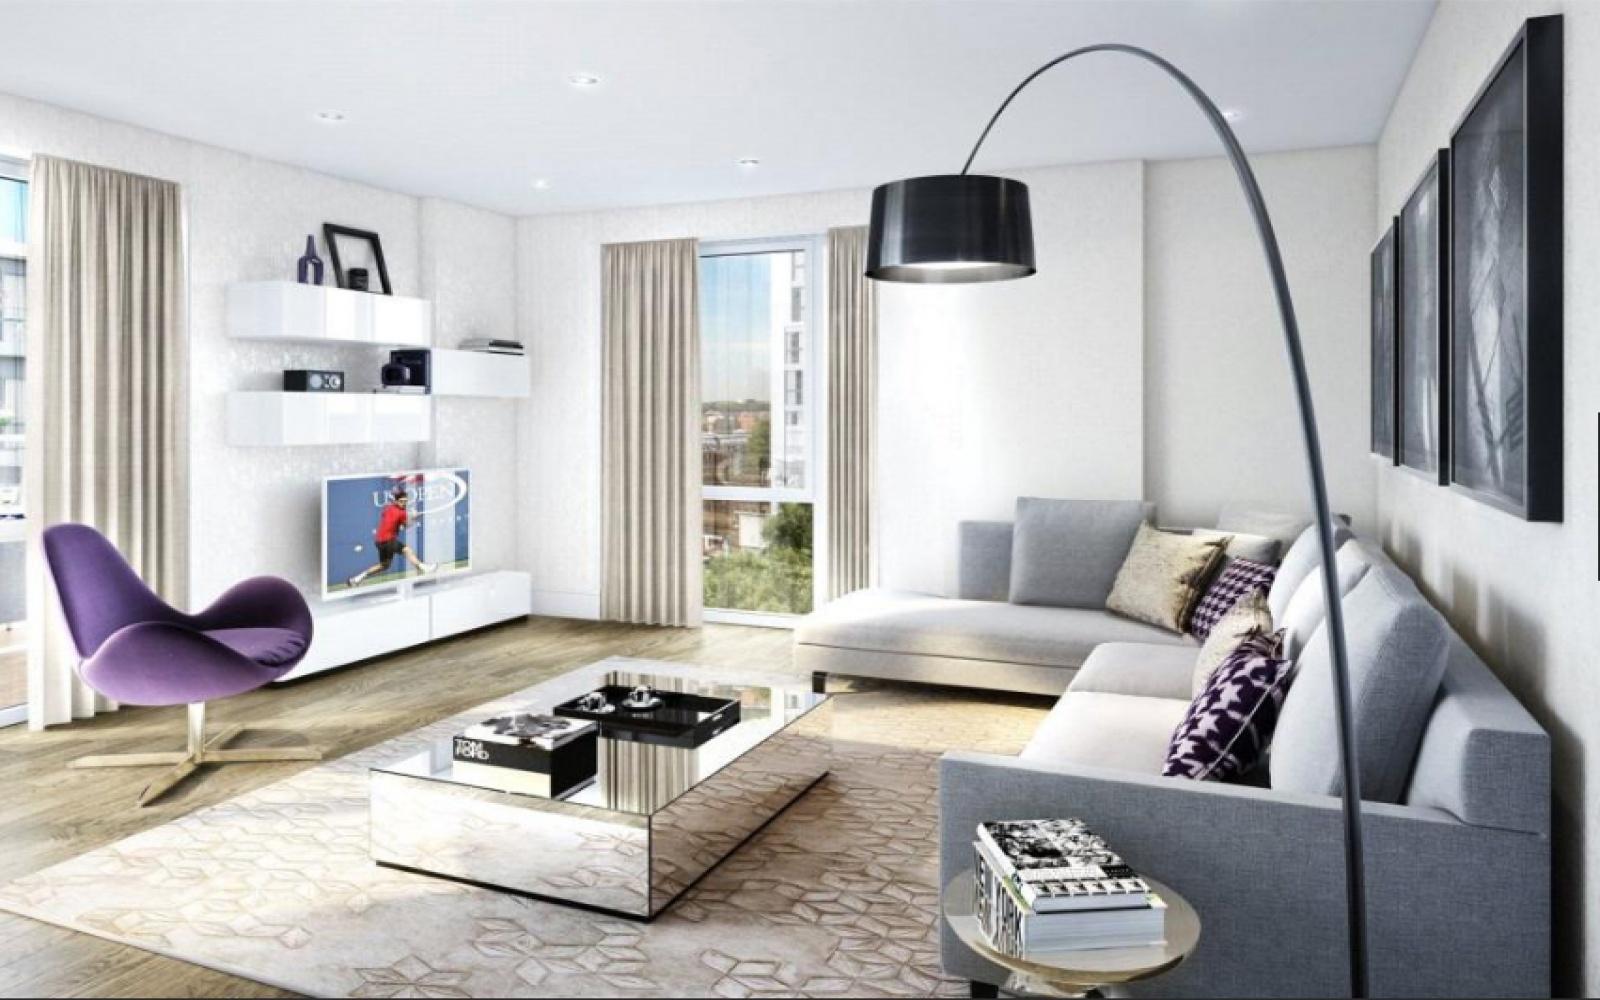 2 Bedrooms, Flat, For Sale, Wandsworth Road, 2 Bathrooms, Listing ID 1043, United Kingdom, Nine Elms,